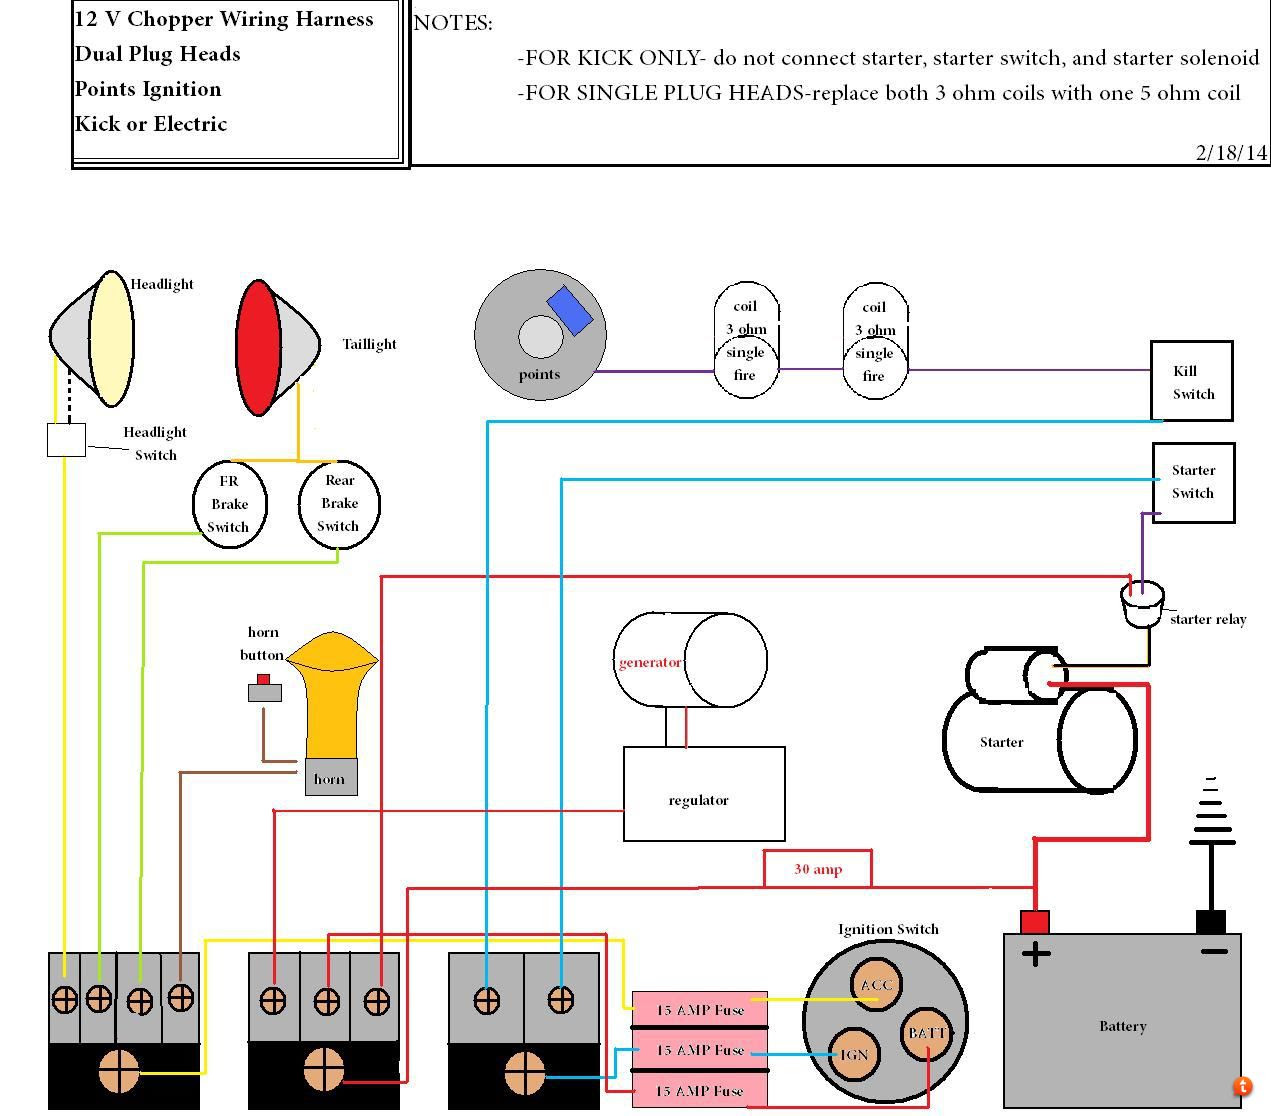 Diagram Wiring Diagram Shovelhead Bobber Full Version Hd Quality Shovelhead Bobber Diagramtyleru Operepieriunite It